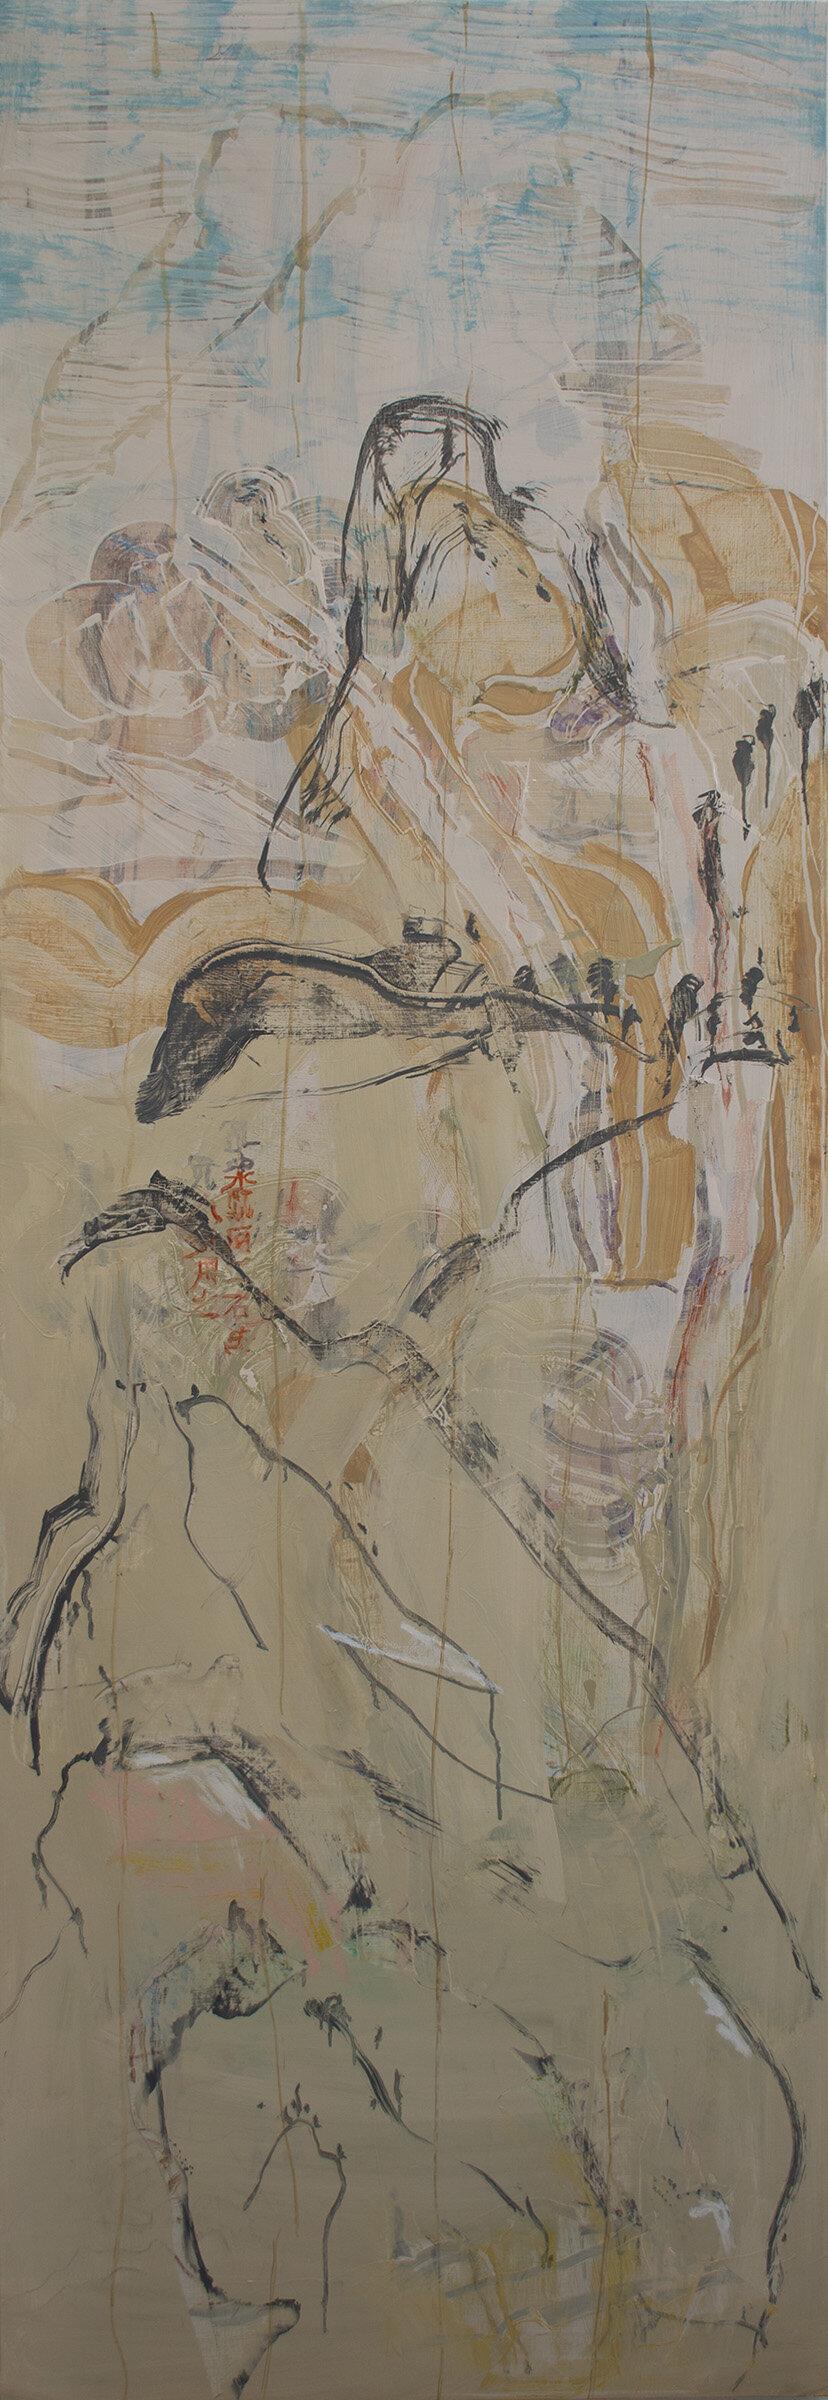 "kwazu no shosa  78x26"" oil, oil stick & colored pencil on linen, 2019"